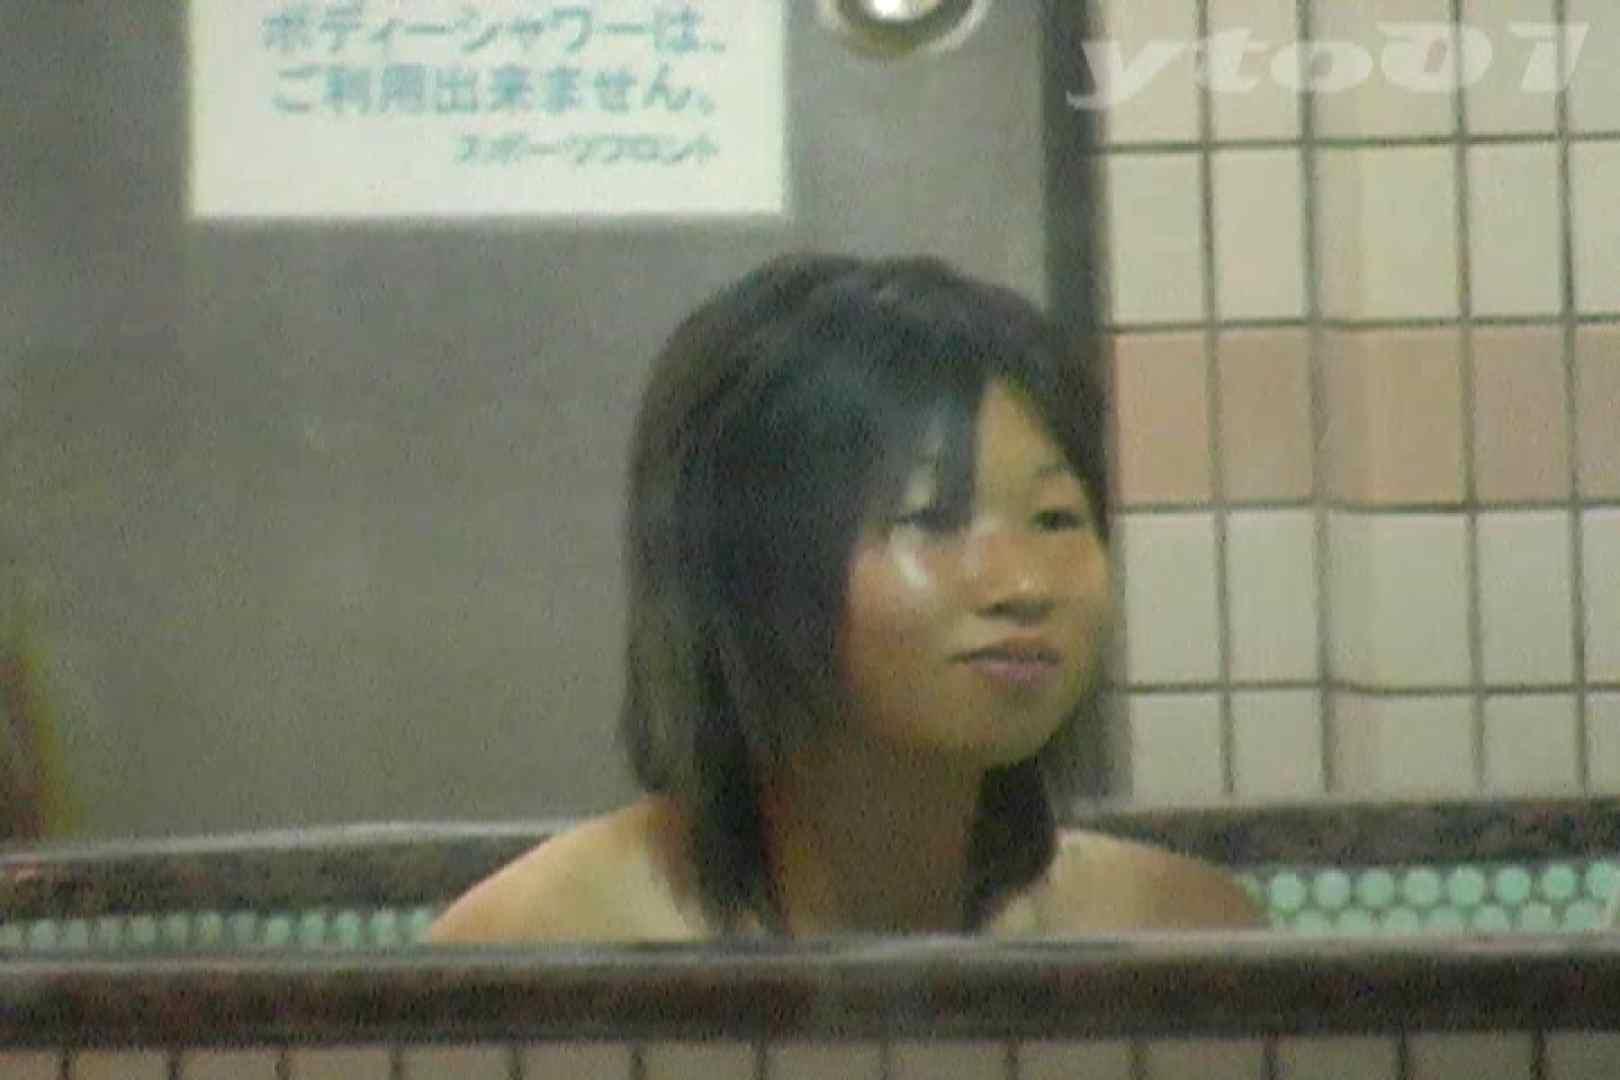 ▲復活限定▲合宿ホテル女風呂盗撮 Vol.07 0 | 0  92画像 50